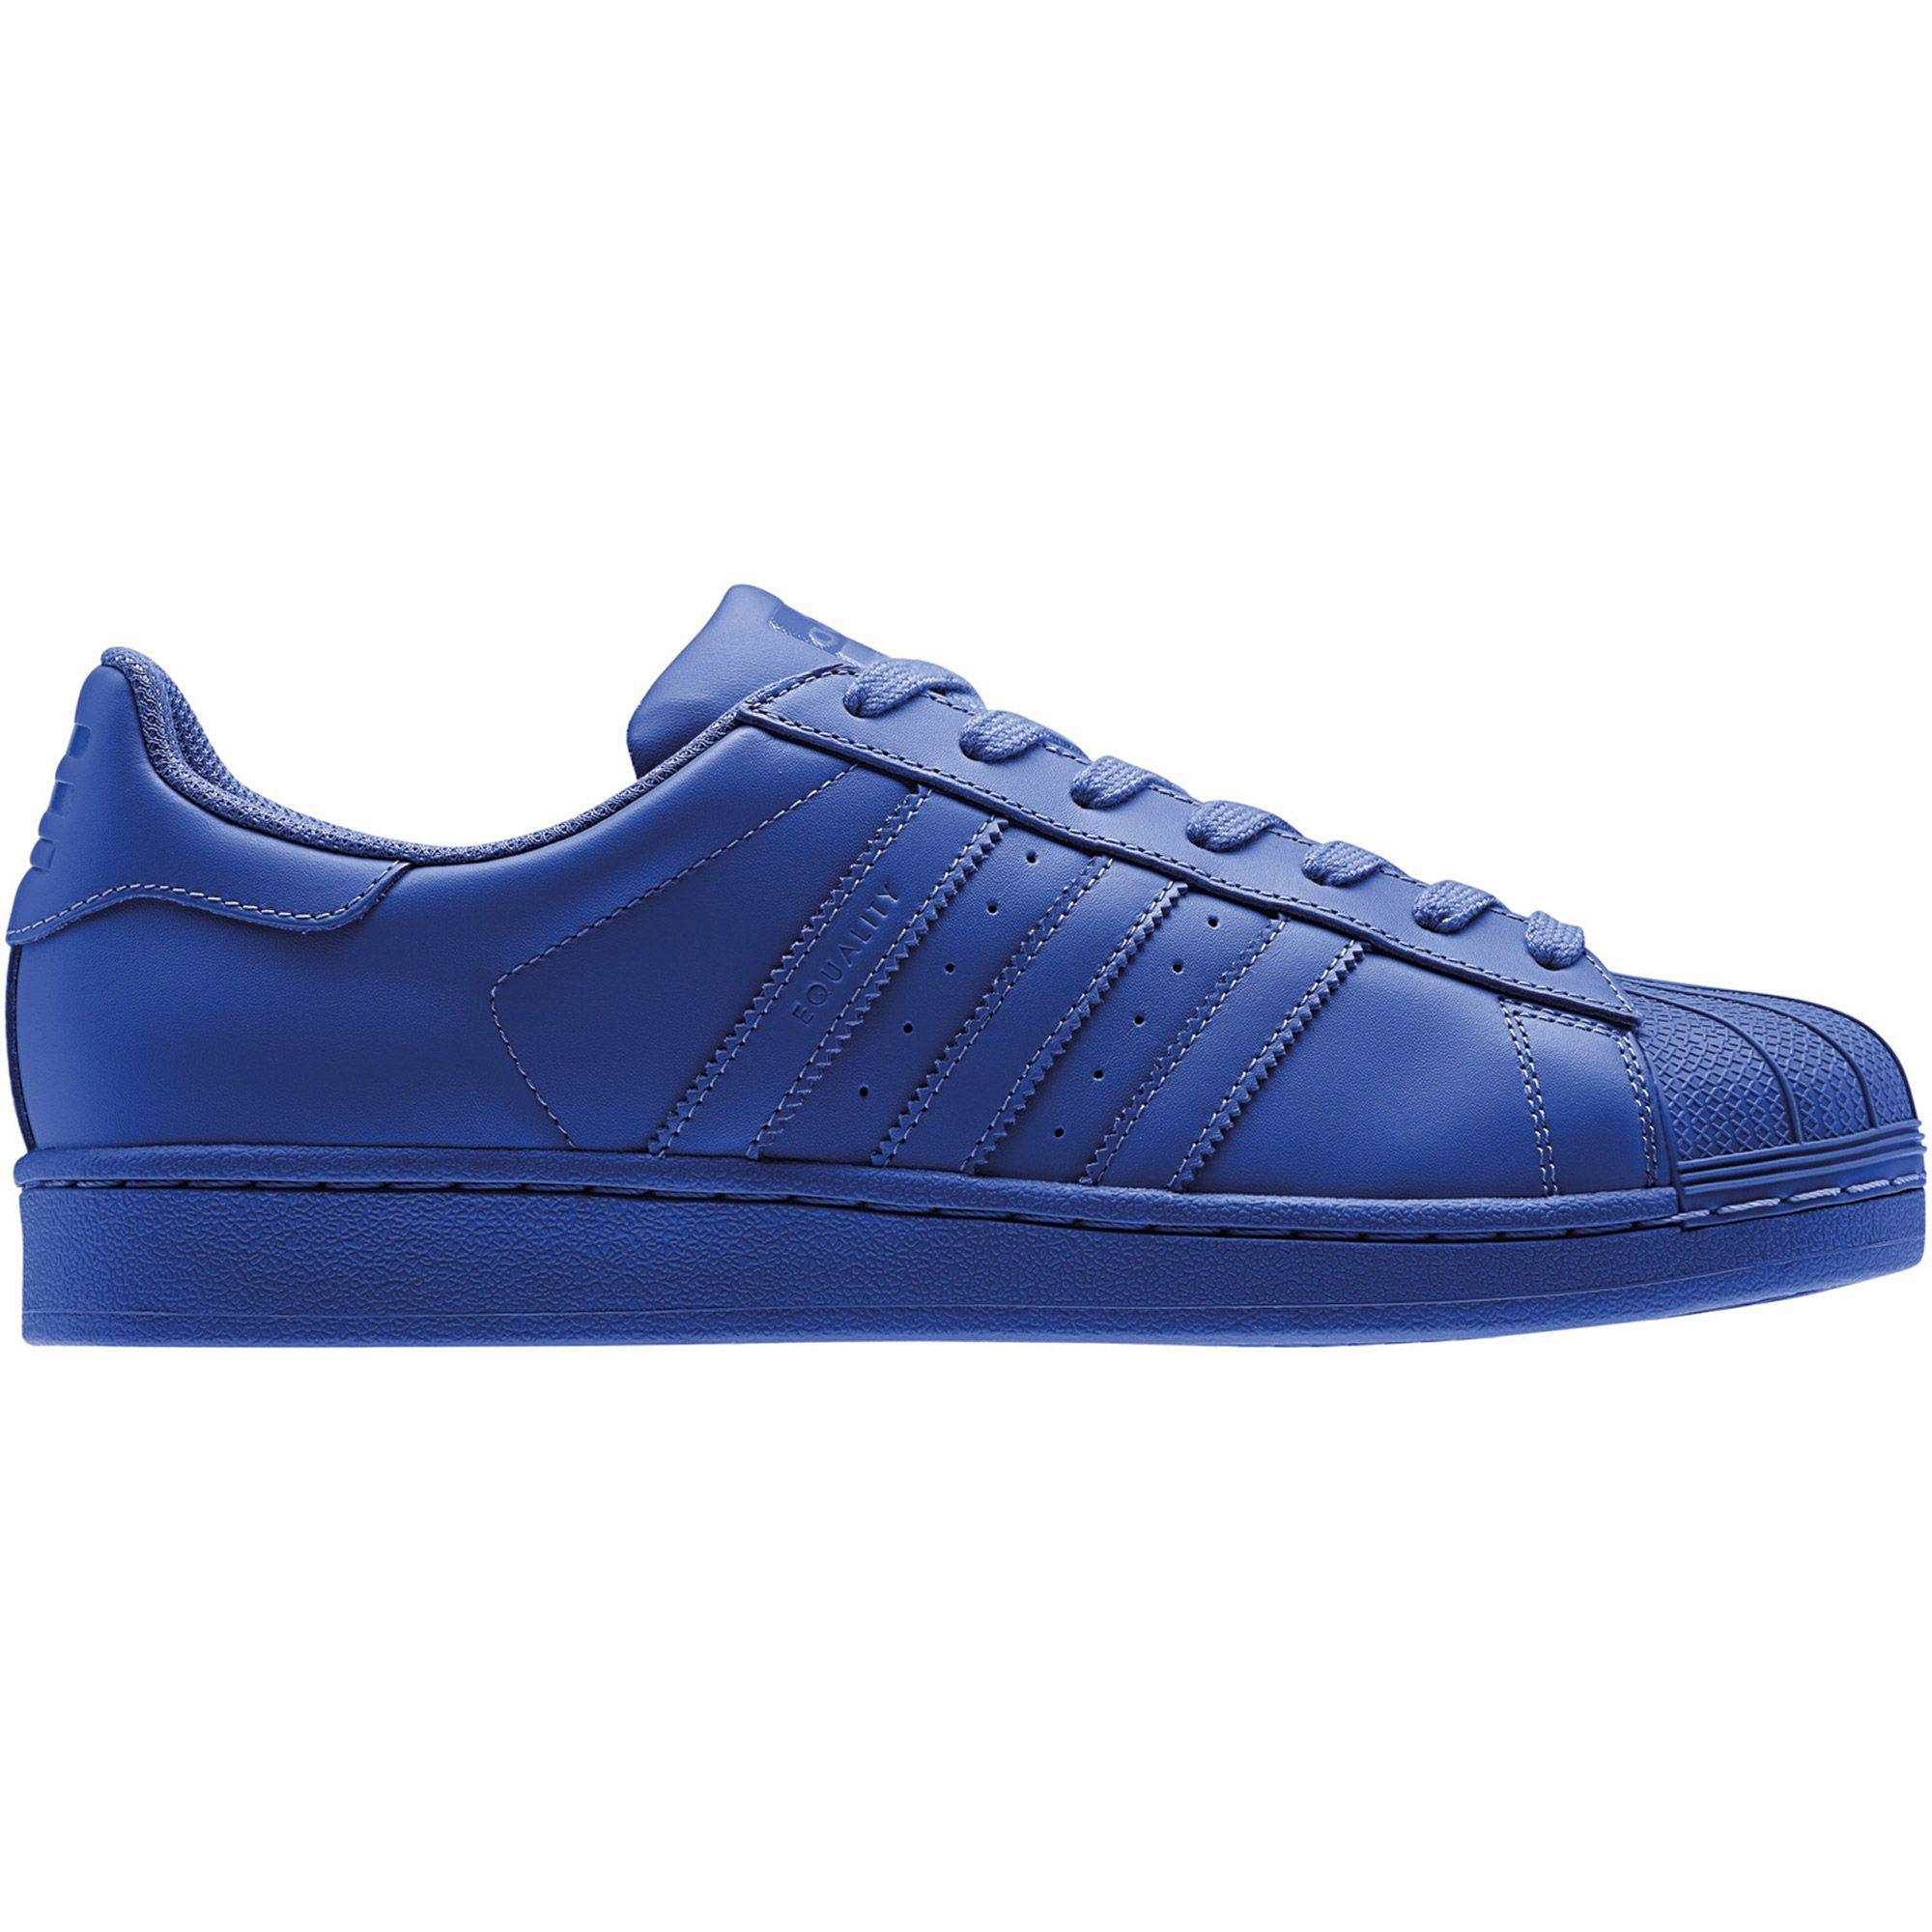 Adidas Supercolor Dark Blue � Superstar SupercolorAdidas SuperstarSneakers  ...